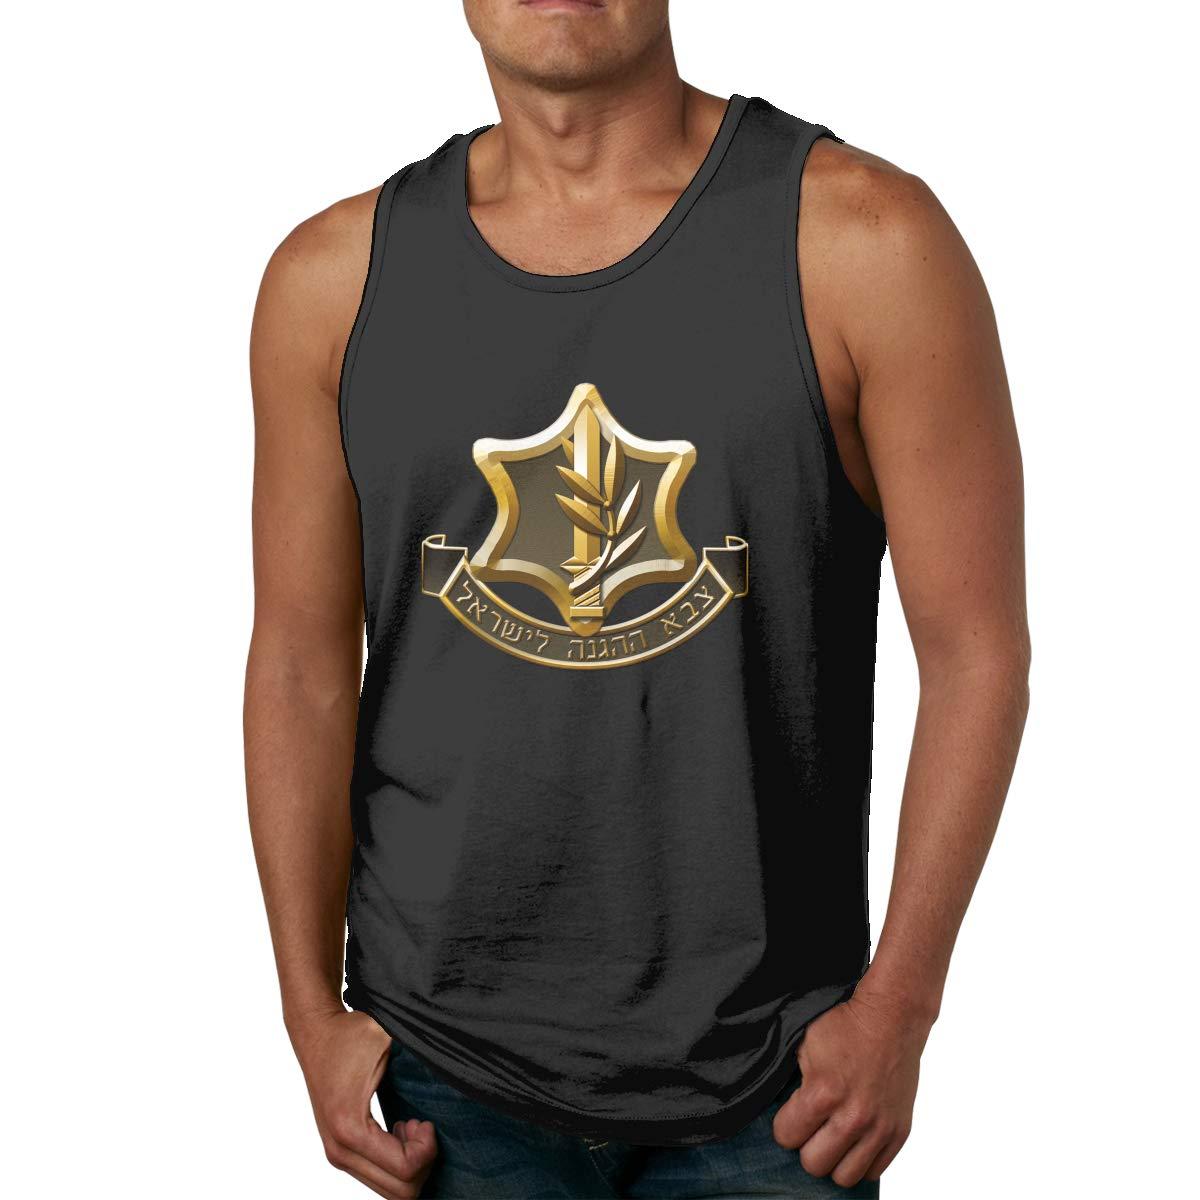 IDF Israeli Defense Force Logo Mens Printed Vest Sports Tank-Top Shirts Leisure Sleeveless T Shirt